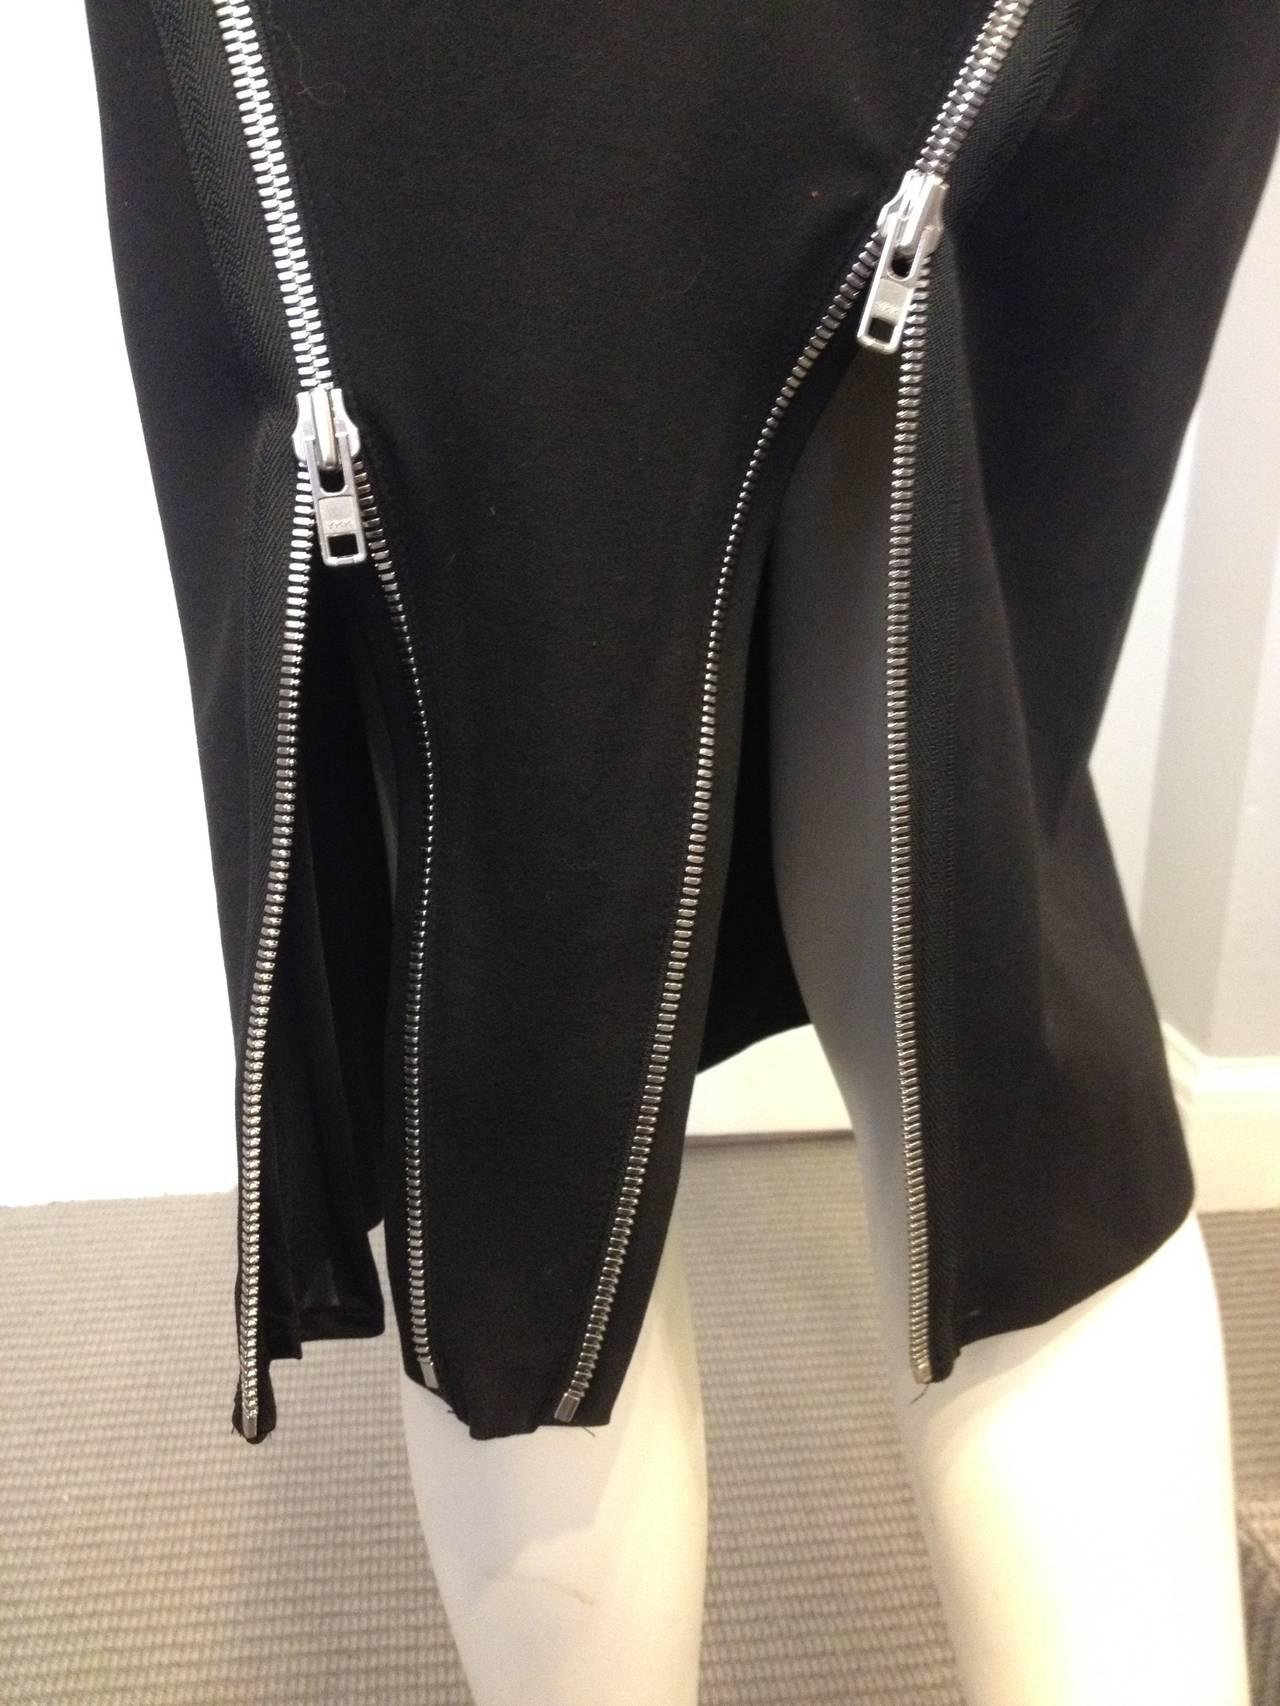 Maison Martin Margiela Black Zippered Pencil Skirt 3